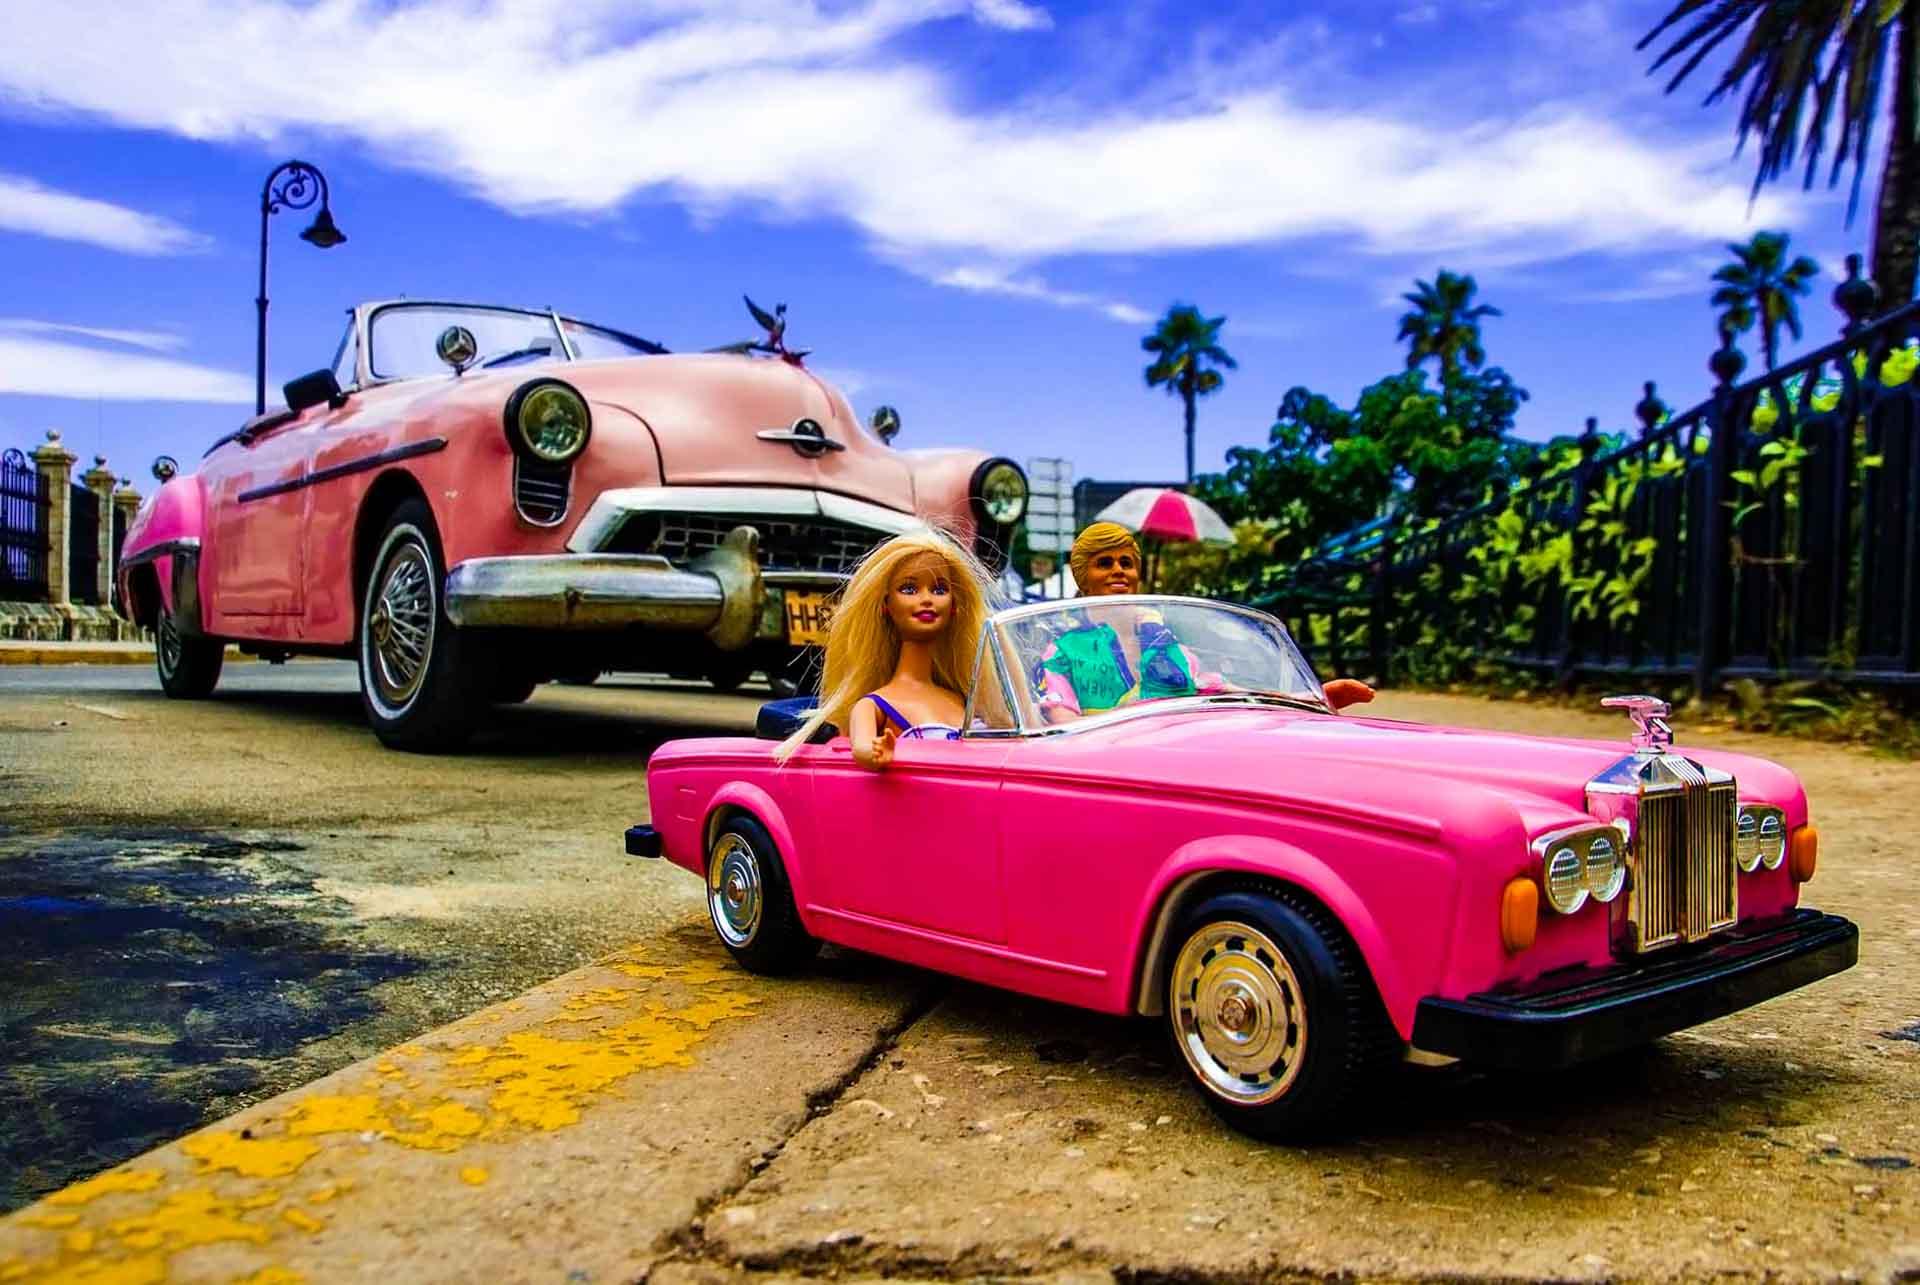 Barbie Around the World Malecon de Havana, havana, cuba, pescart, photo blog, travel blog, blog, photo travel blog, enrico pescantini, pescantini